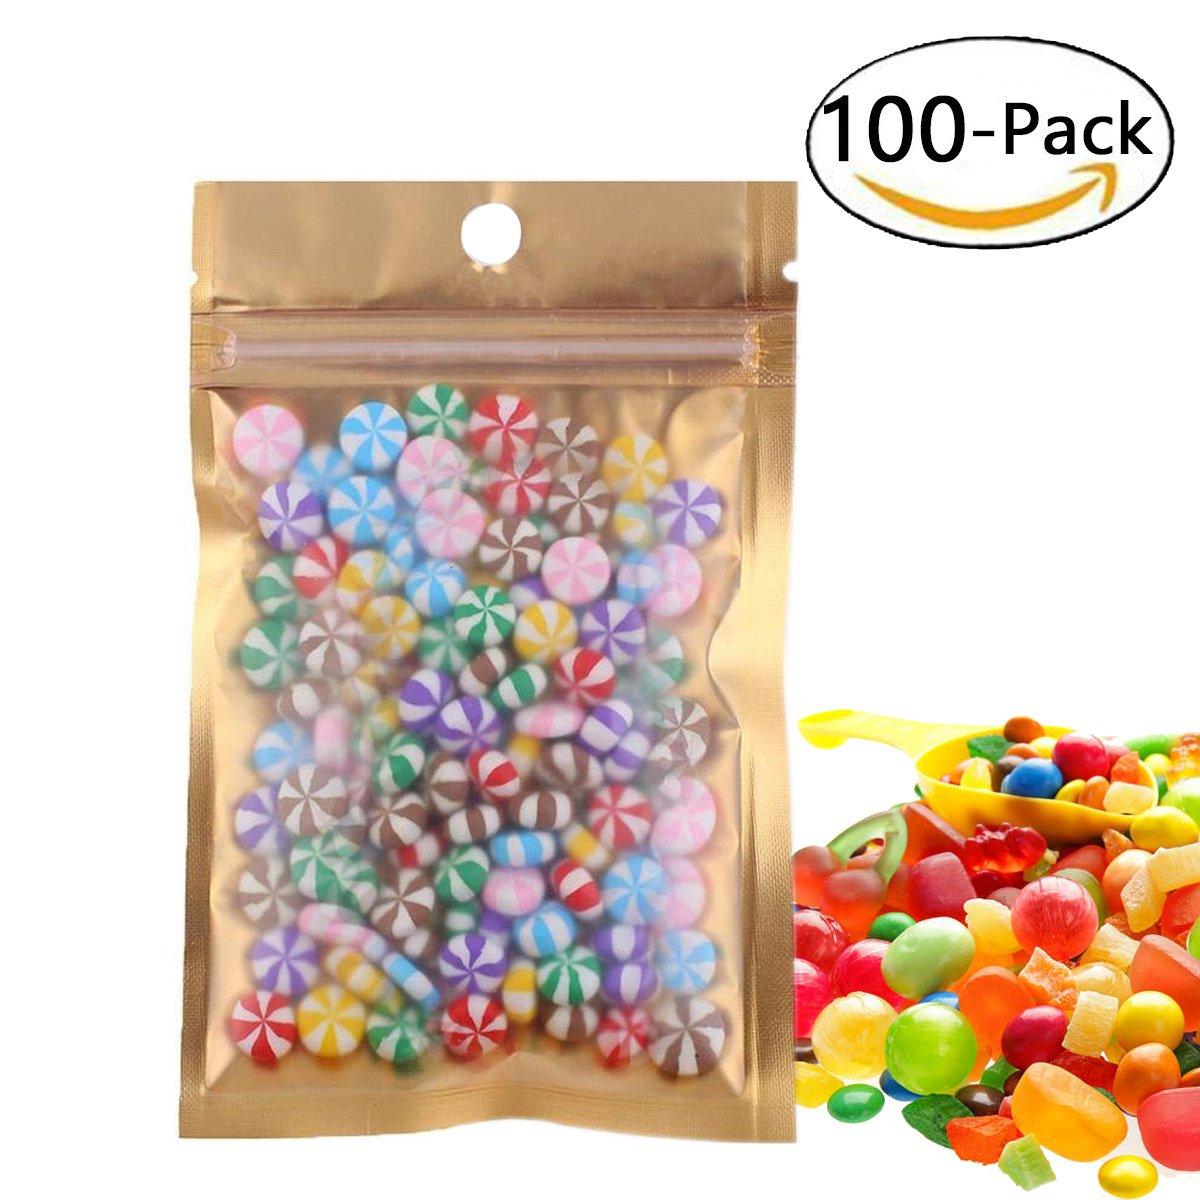 Wekoil Mylar Bags Zip Lock Clear Golden Front Aluminum Foil Wrapper Bags Resealable Packaging Storing Zipper Pouches Bulk Food Saver Lined Grip Wrap 10cmx18cm/4''x7'',PACK 100 Bags.